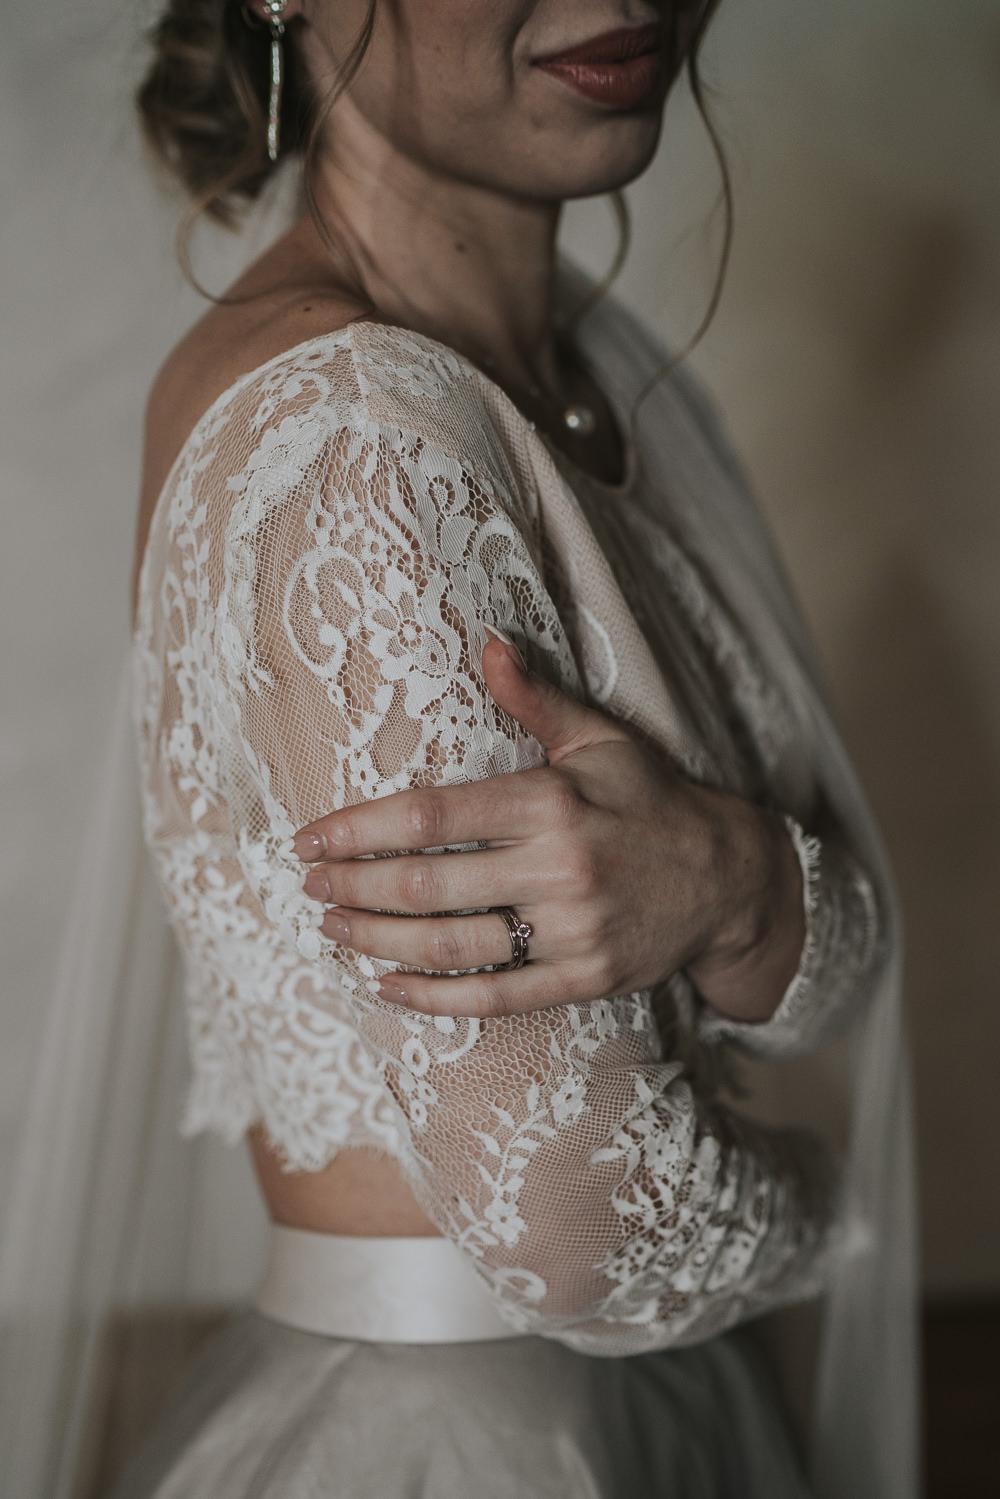 Dress Gown Bride Bridal Separates Lace Top Tulle Skirt Veil Grey Wedding Ideas Grace Elizabeth